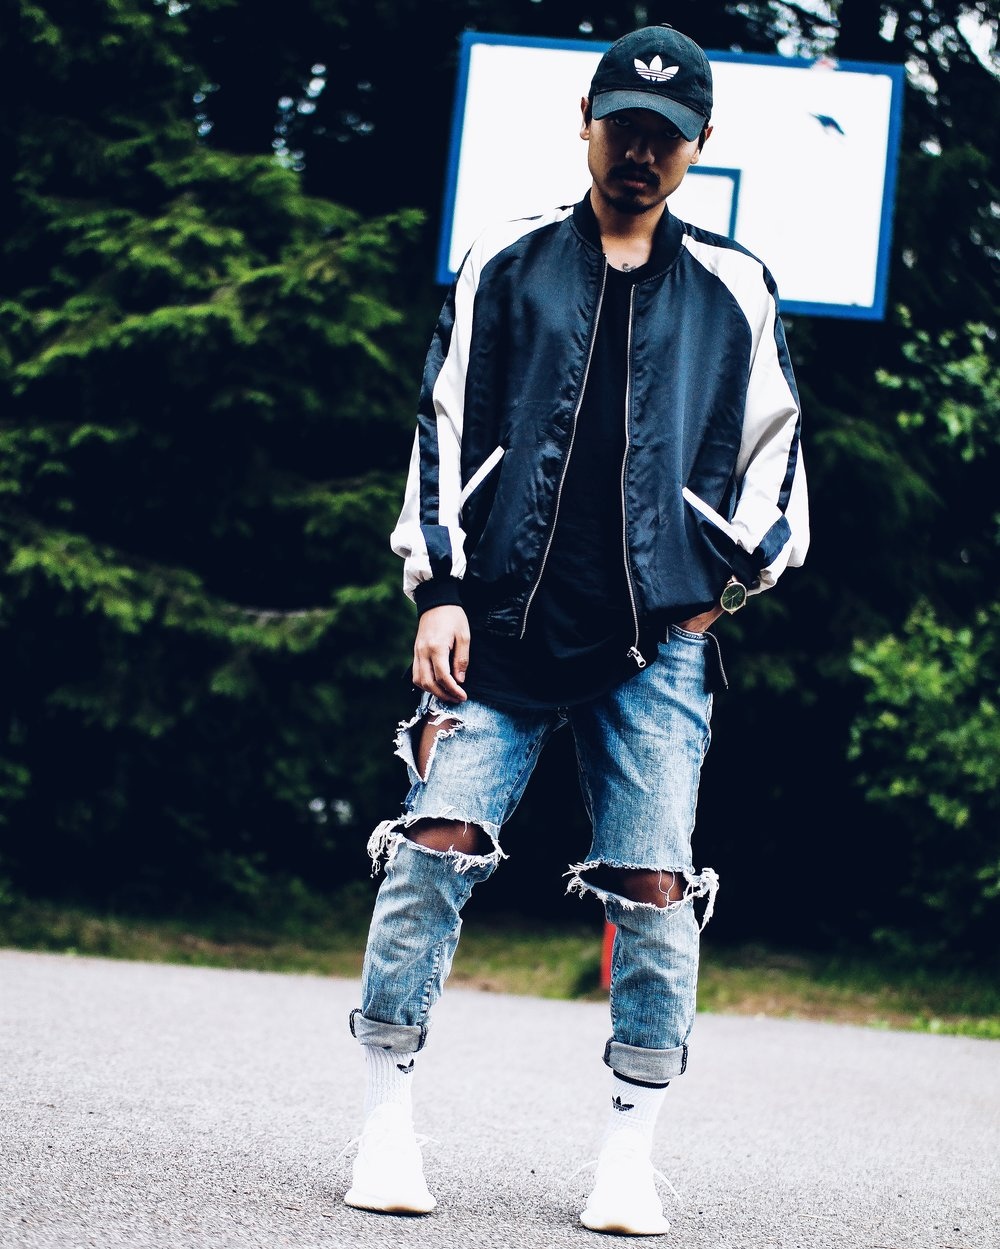 Men's Summer Streetwear,Men's Summer Street Style,Fashion From Norway,Thai Fashion Blogger,July Fashion,Summer Fashion Inspiration,Men's Street Outfits,European Street Style,Teddy Upacut 8